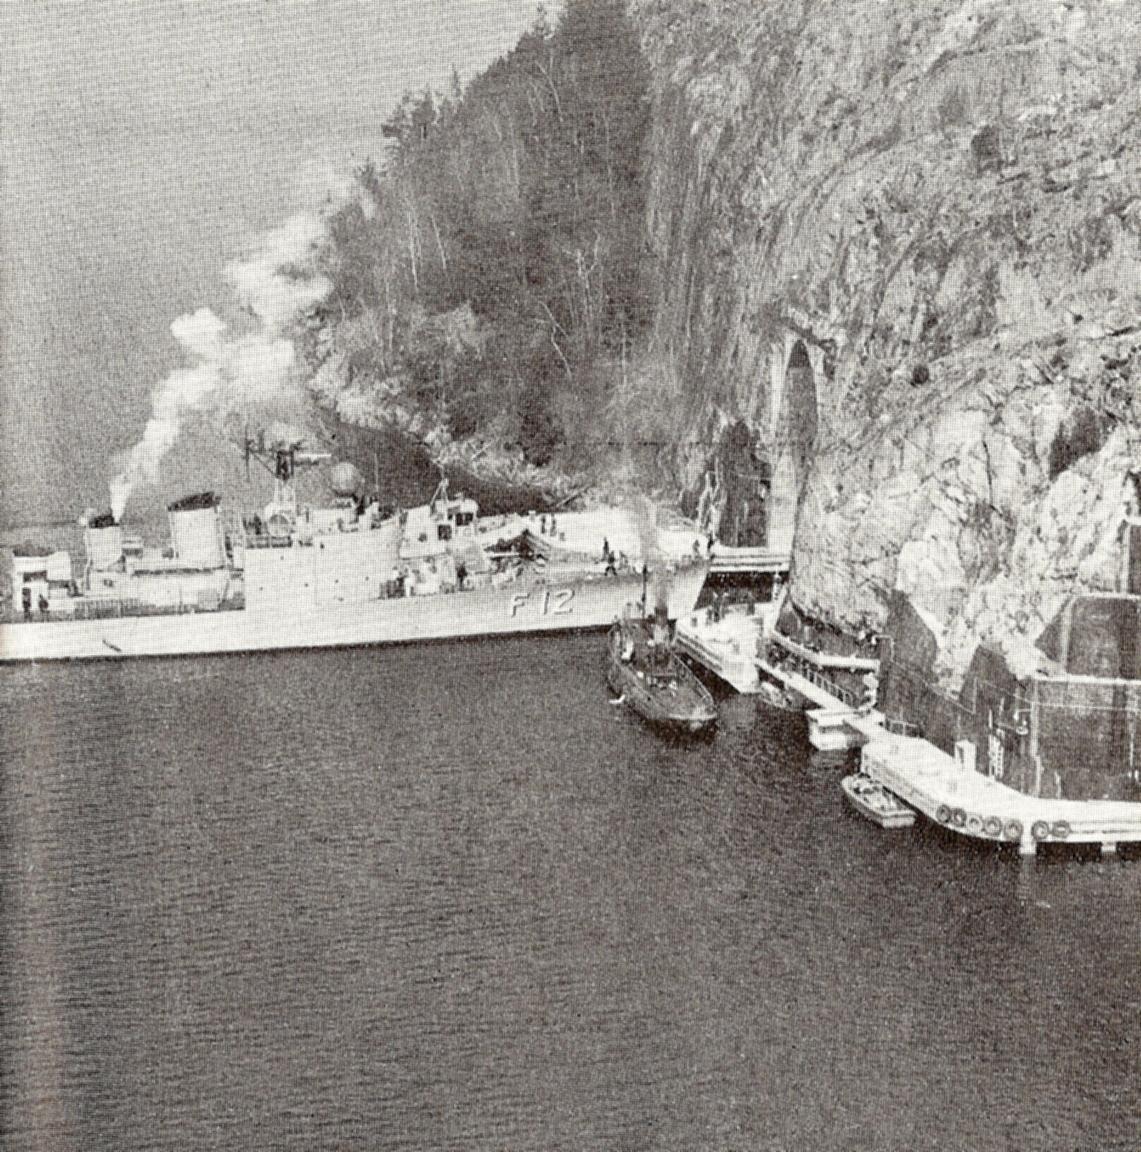 HMS_Sundsvall_in_Tunnel.jpg